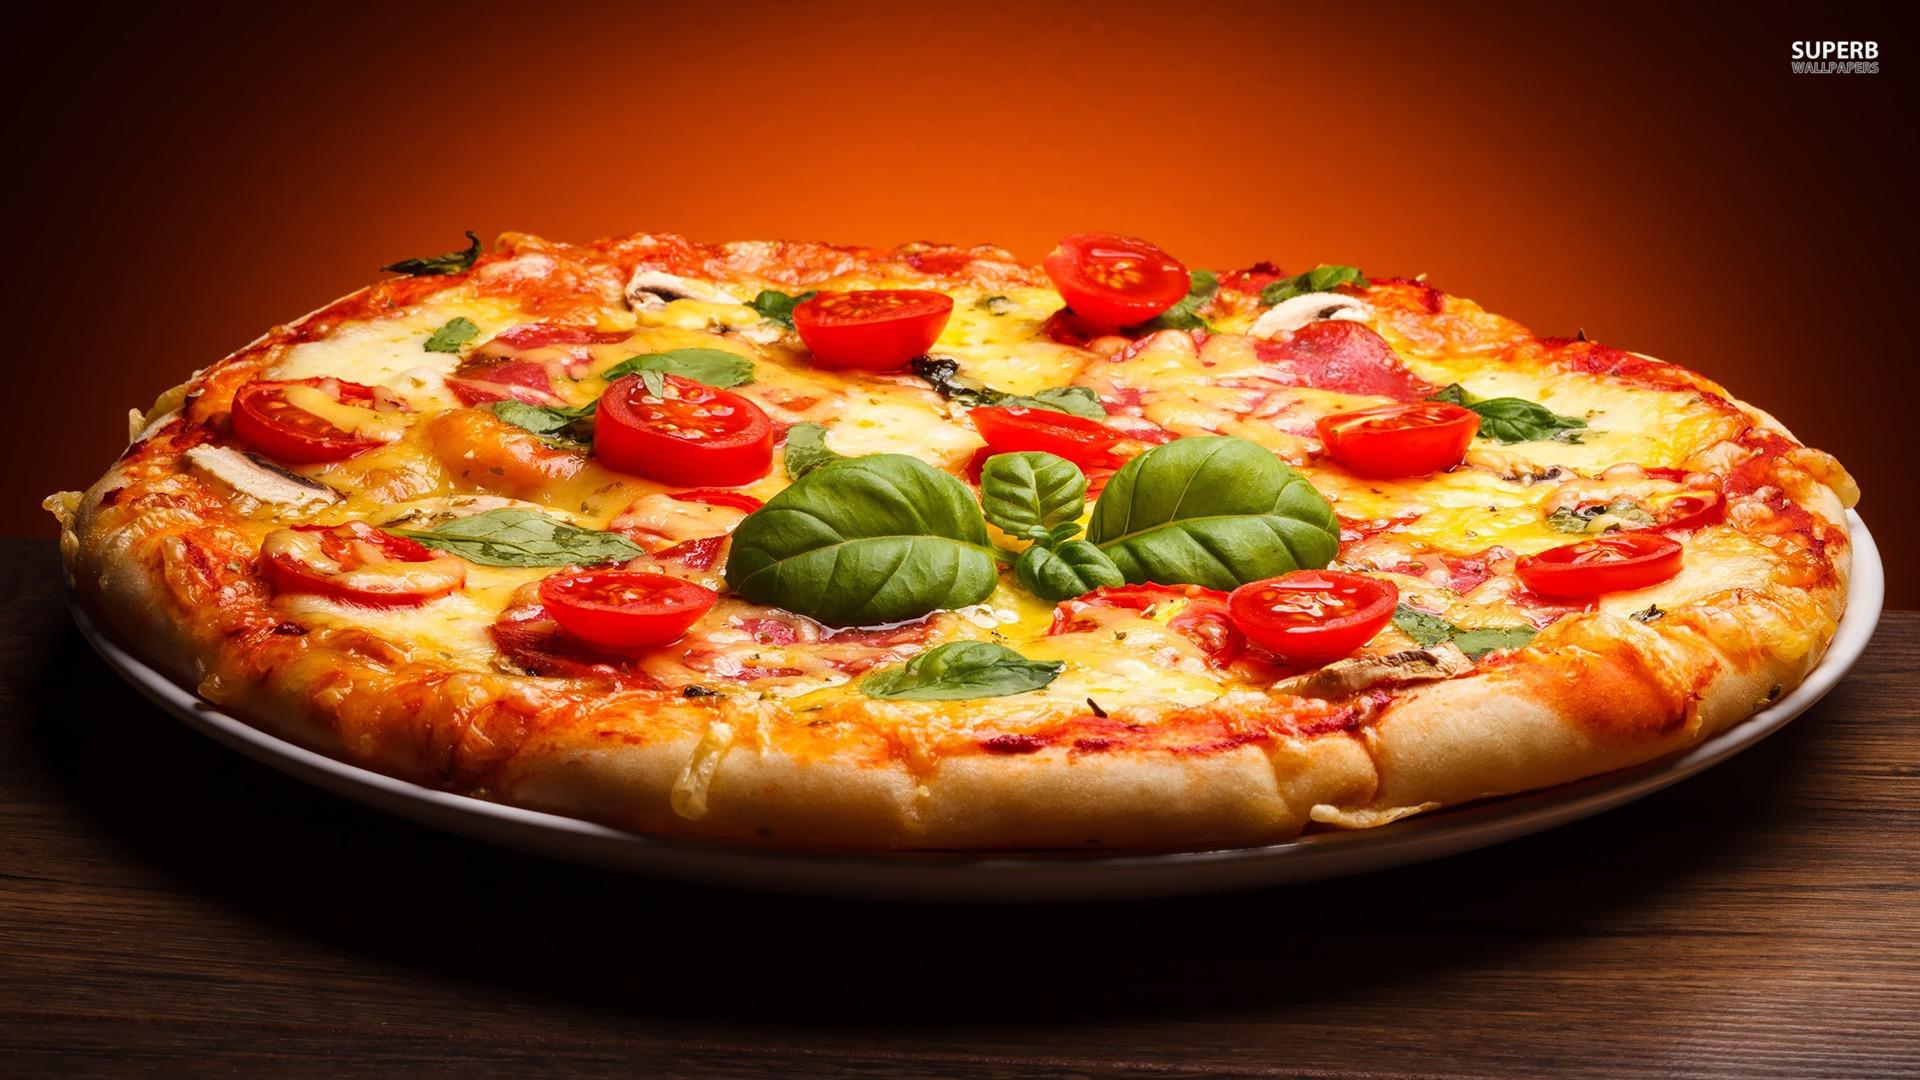 Pizza wallpaper 1920x1080 jpg